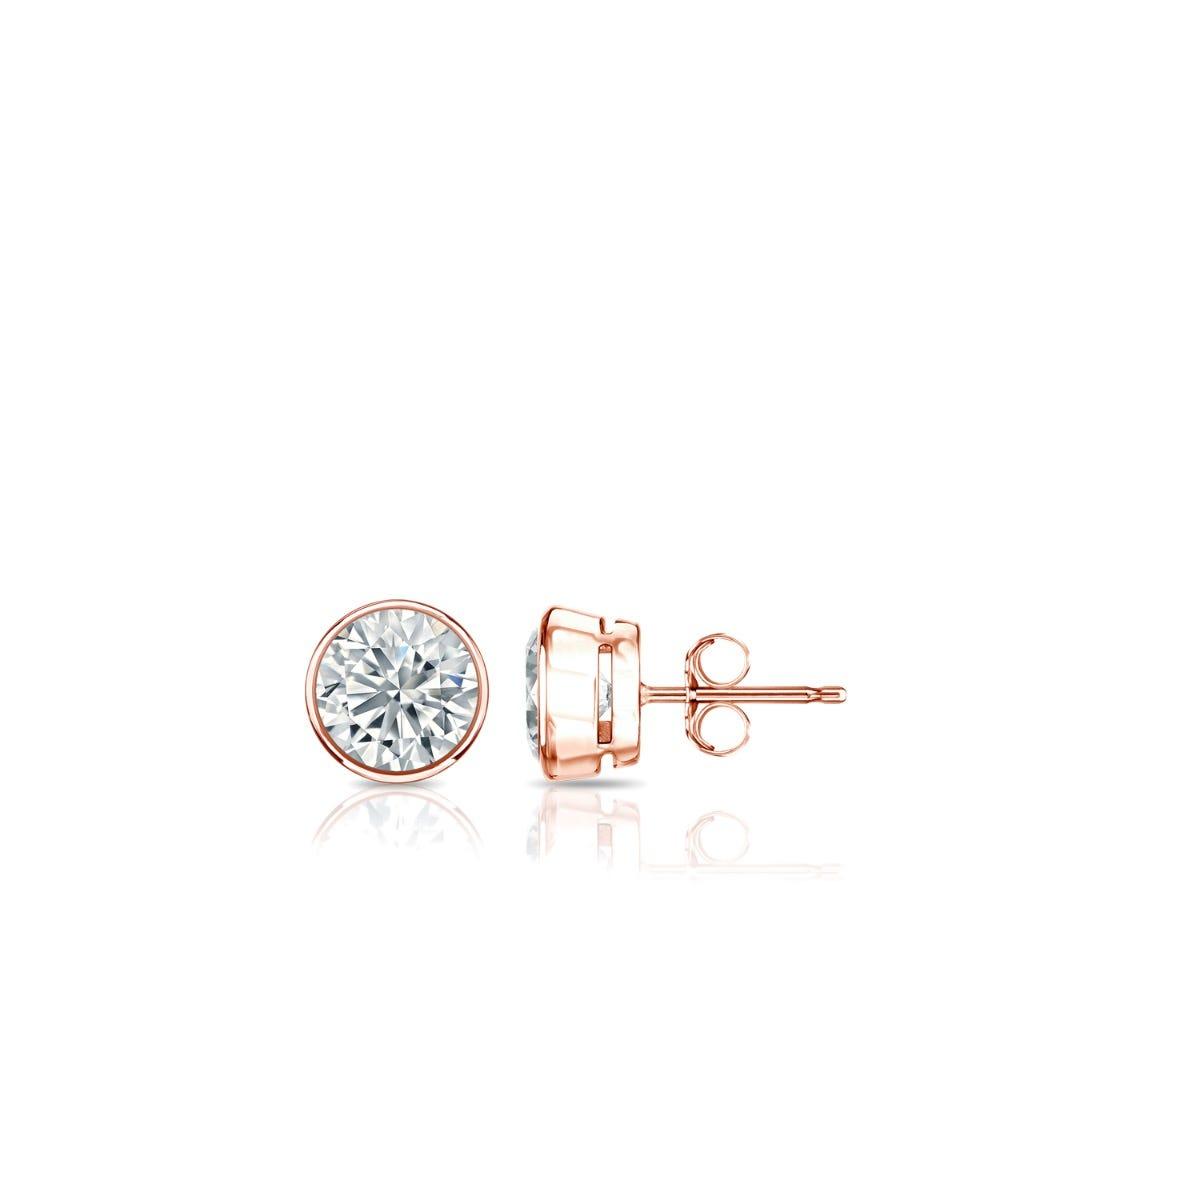 Diamond Round Bezel-Set 1/7ctw. Solitaire Stud (IJ-SI1) Earrings in 14K Rose Gold